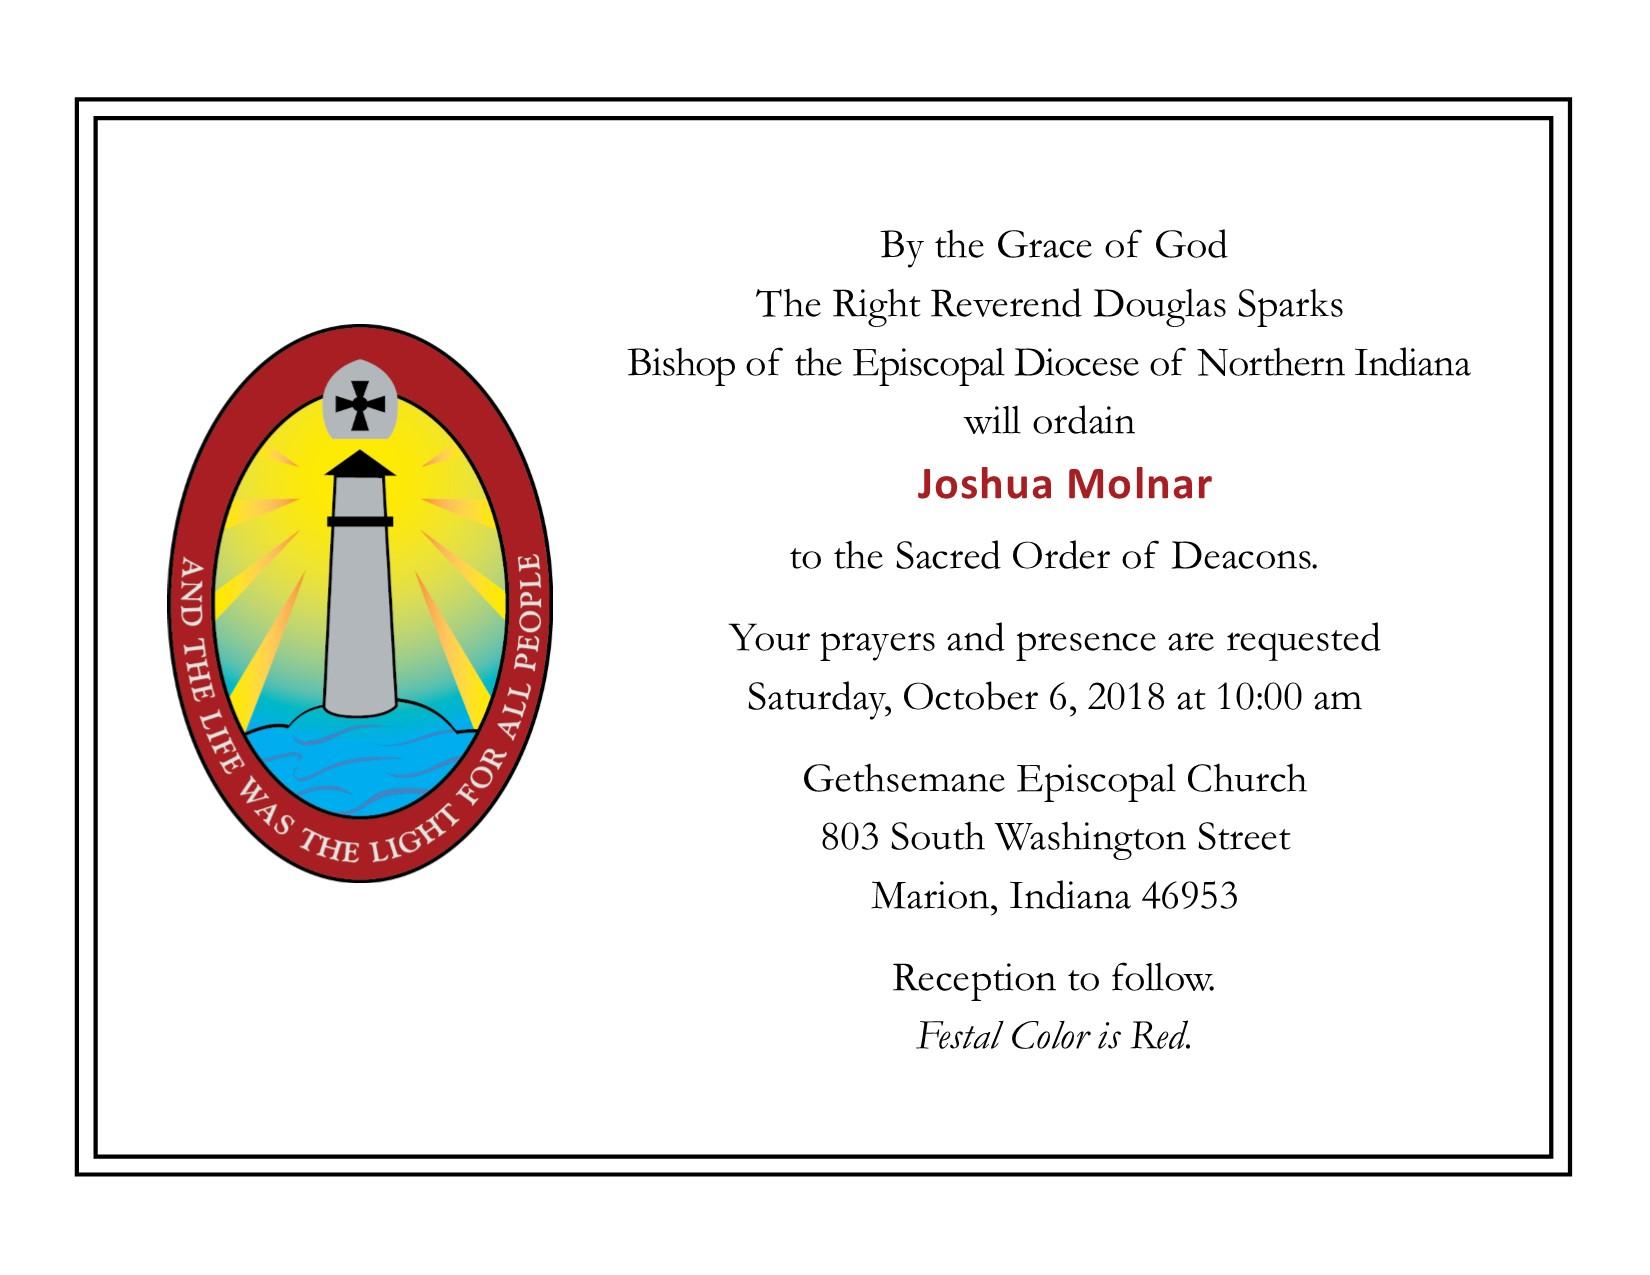 2018-10-06 Ordination Invite Joshua Molnar - Deacon.jpg